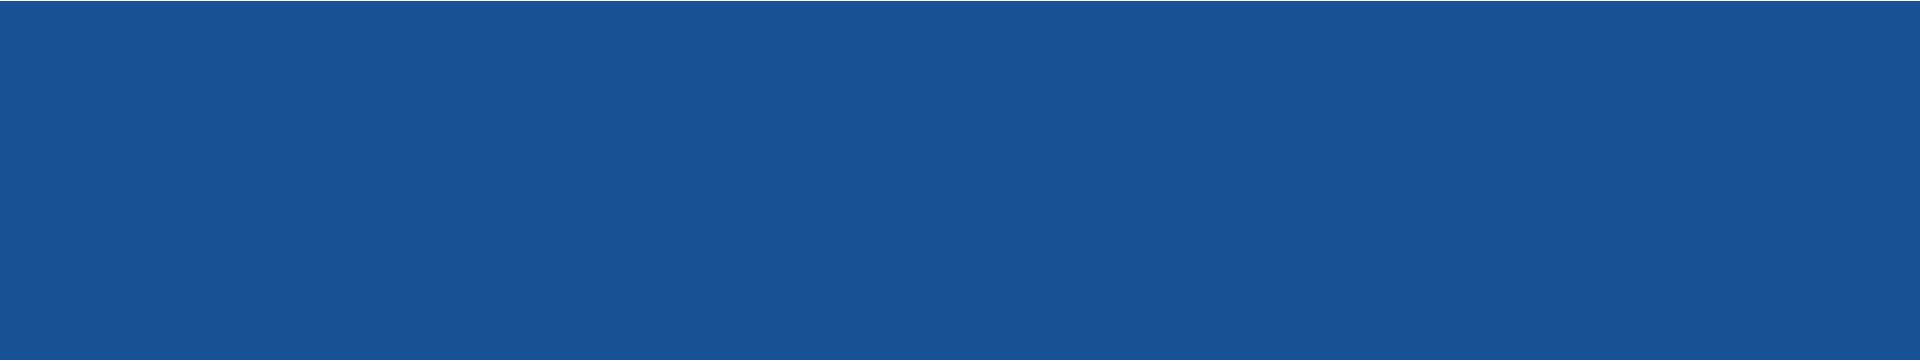 StarMAX-Div-Azul02.png